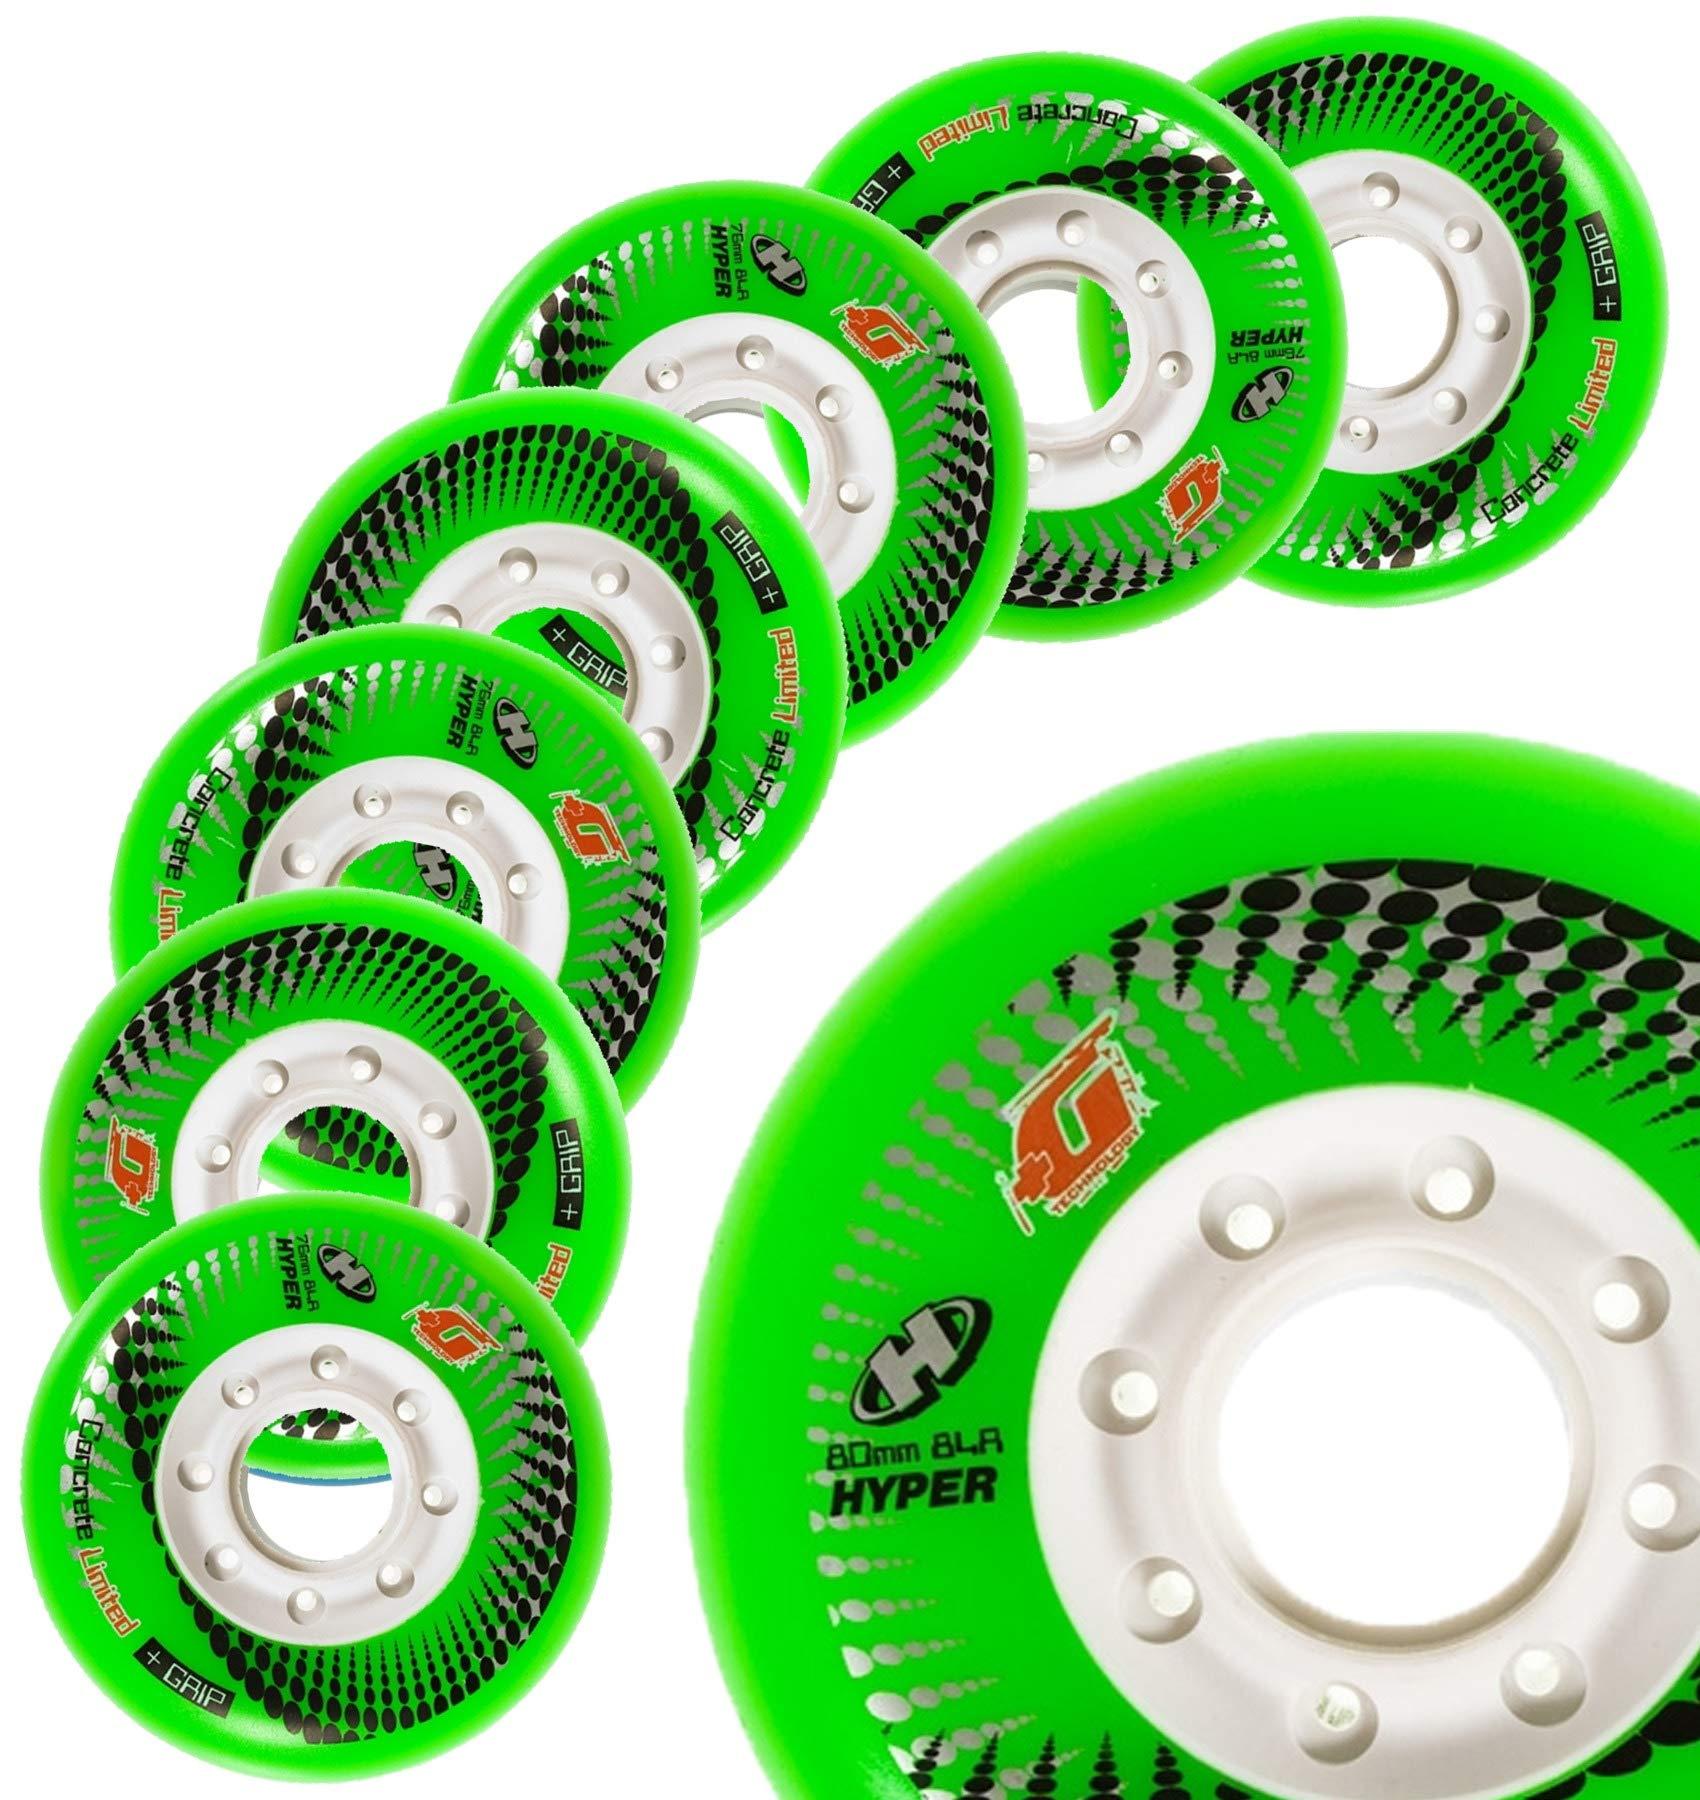 Inline Skate Wheels Hyper Concrete +G - 8 Wheels - 84A - Sizes: 72MM, 76MM, 80MM - Freeride, Slalom, Fitness, Urban - Colors: White, Black, Orange, Green, Cyan, Red (Green, 80MM) by Hyper Wheels